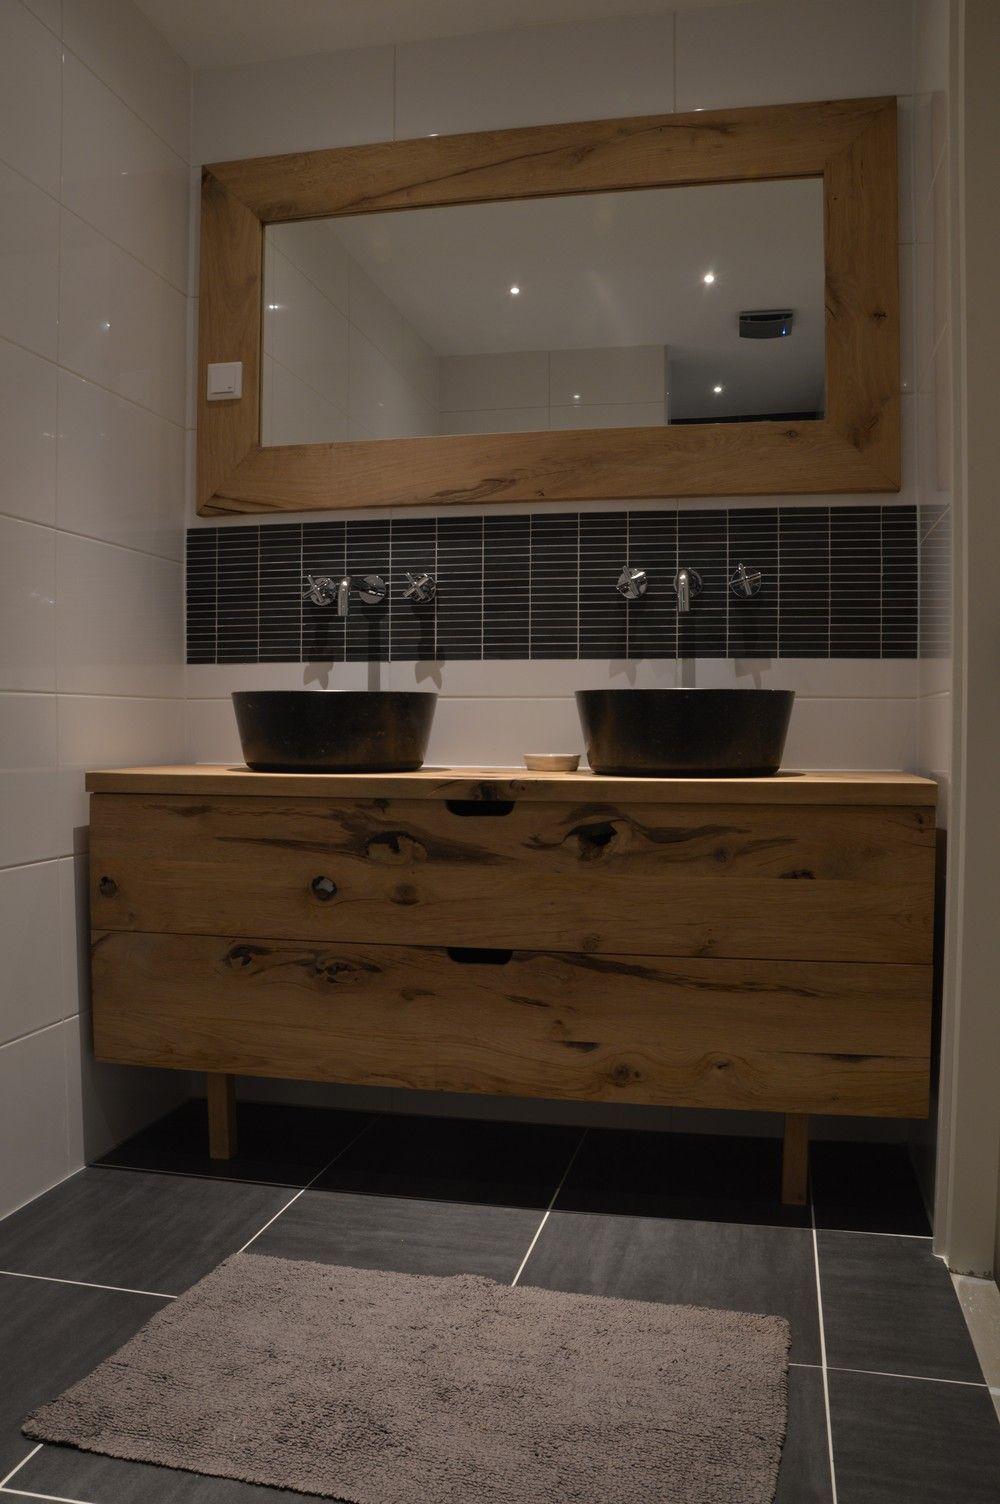 badkamermeubel hout - Google Search | Bathrooms | Pinterest